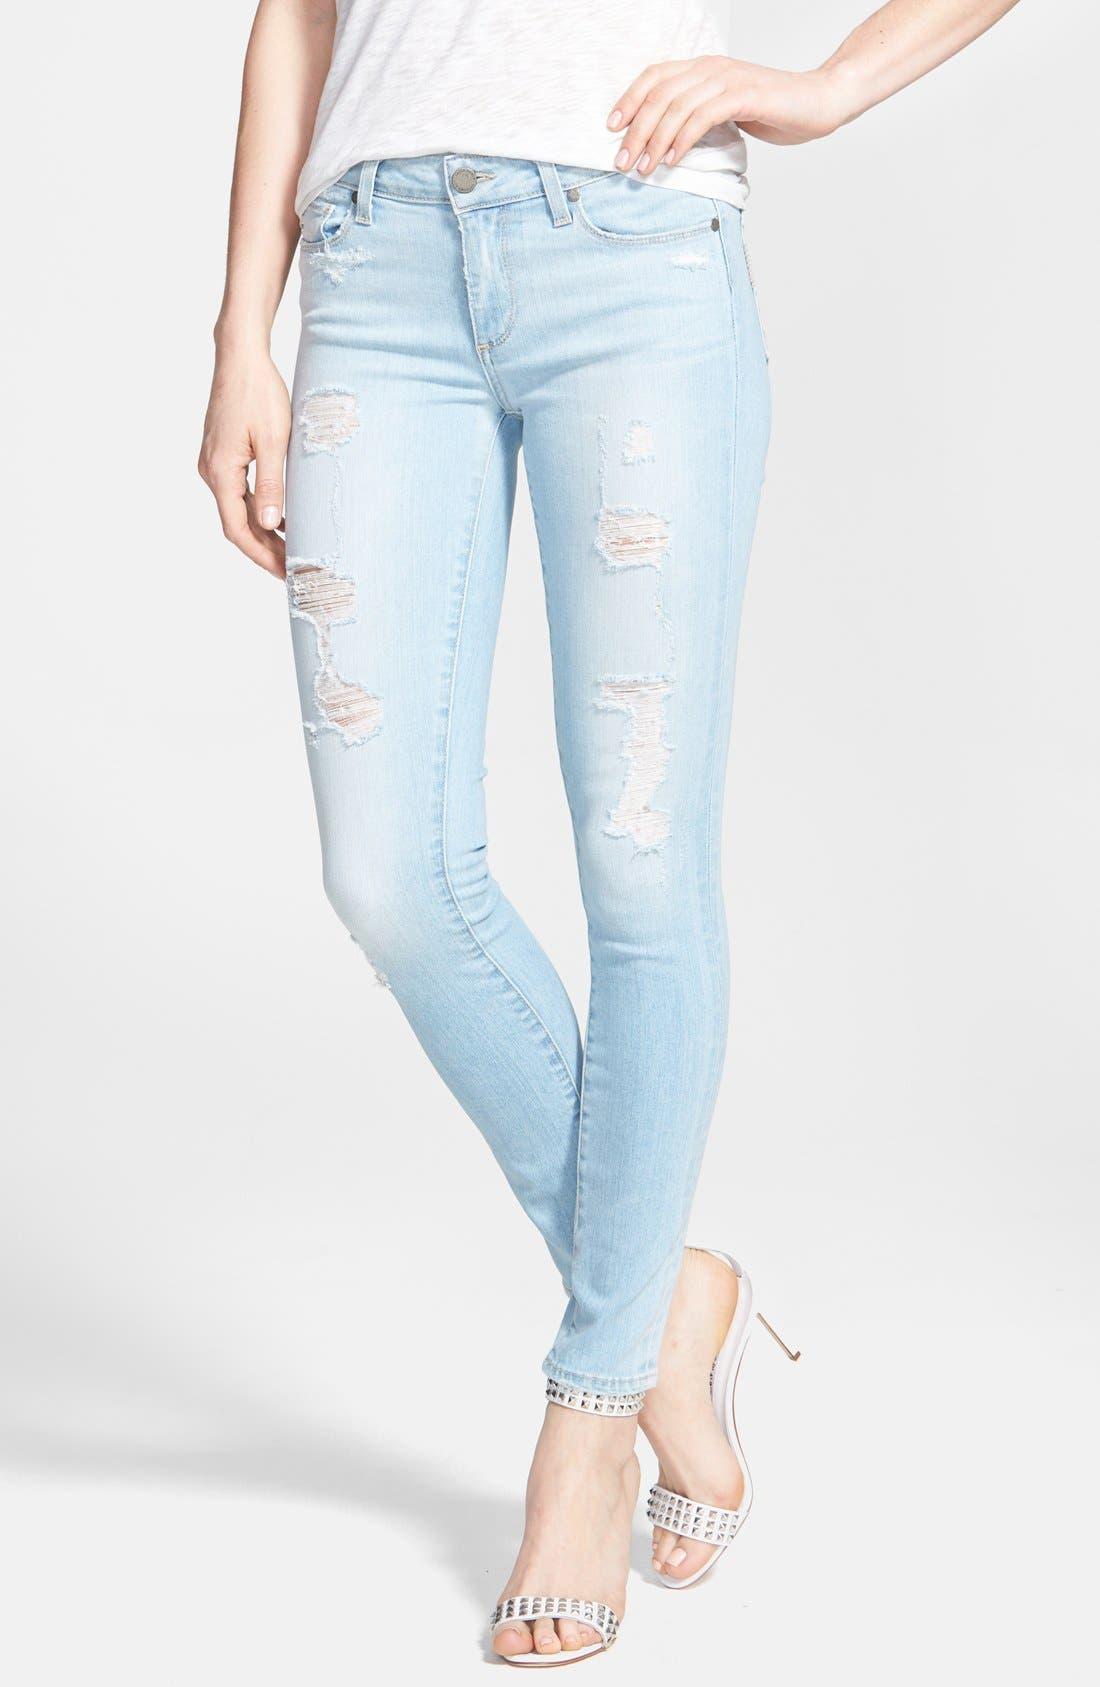 Main Image - Paige Denim 'Verdugo' Destroyed Crop Skinny Jeans (Naomi Destructed)